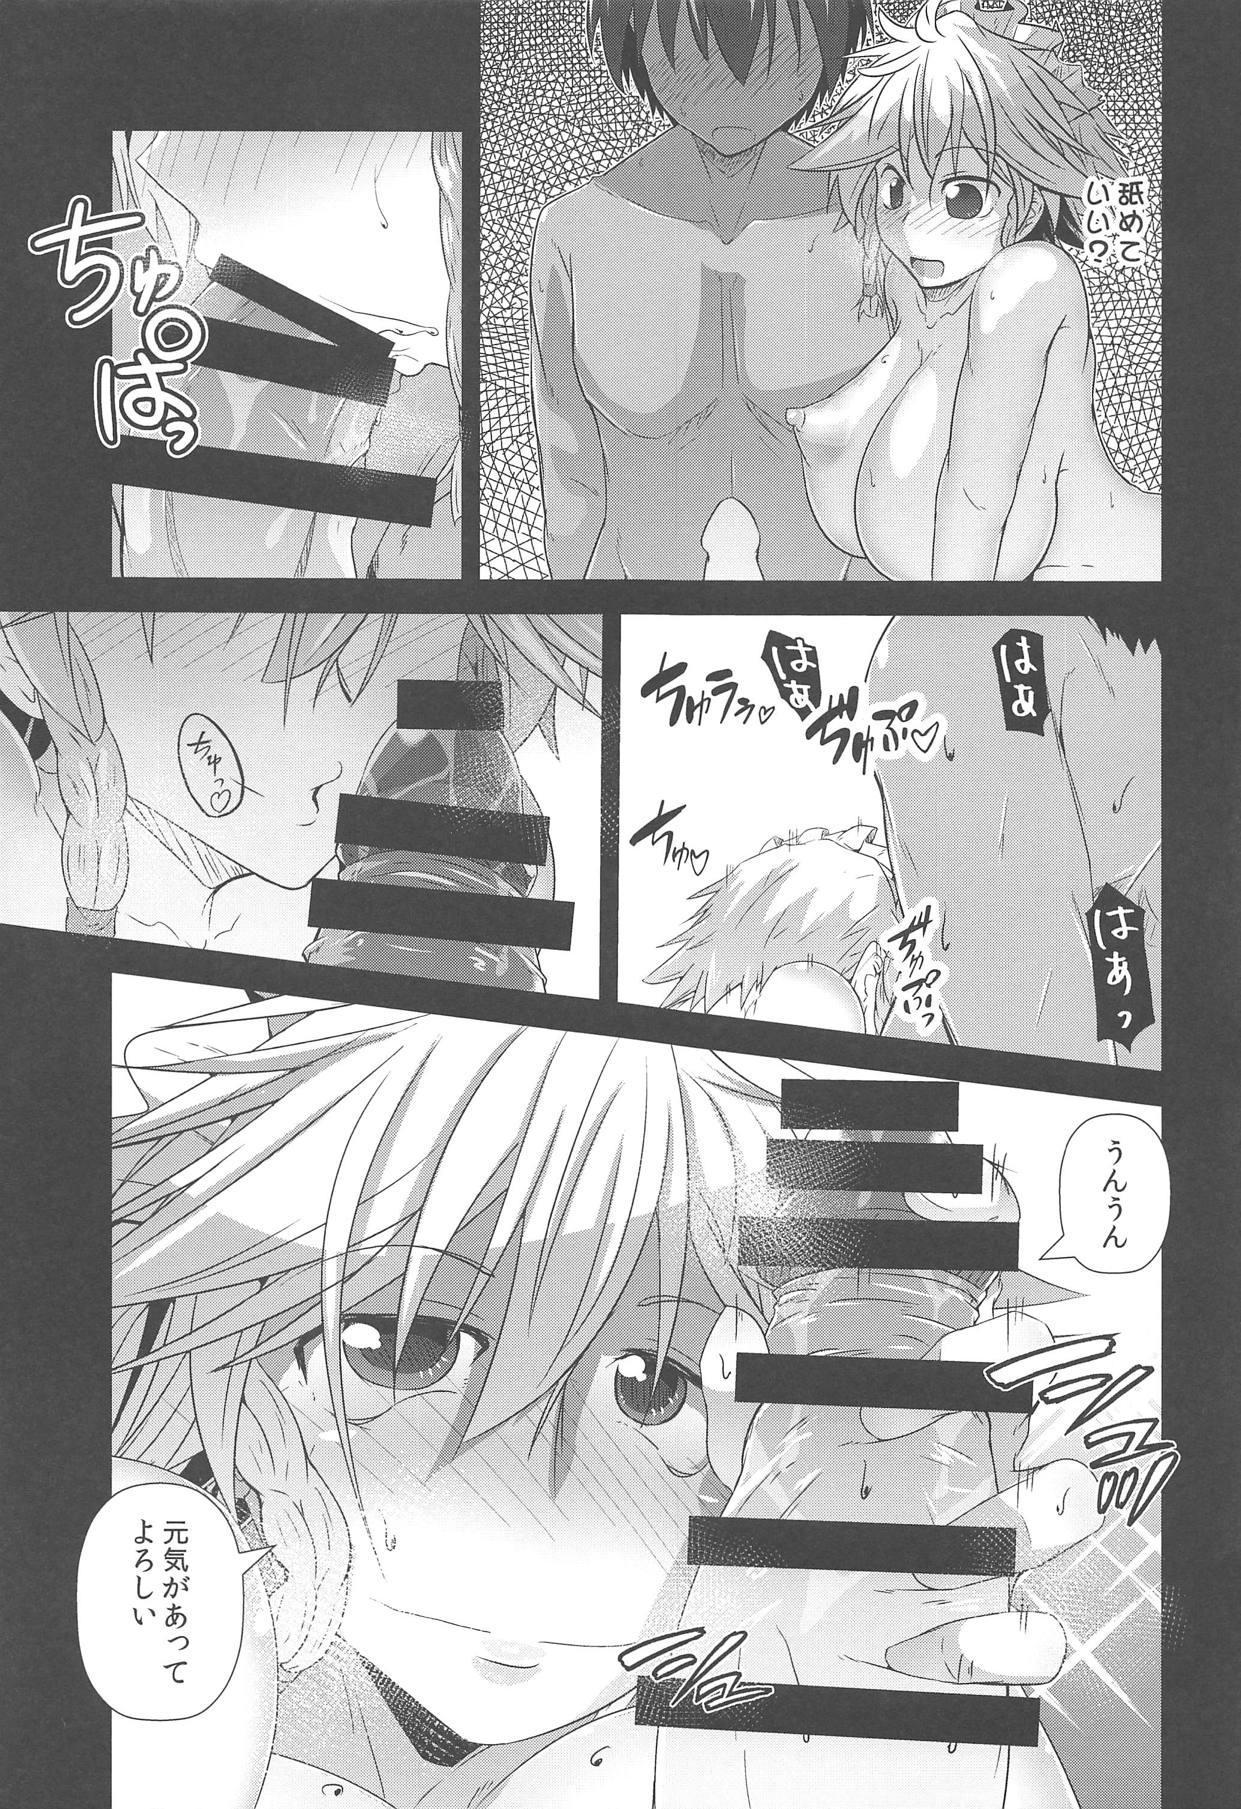 Sakuya-san to SeFriex 15